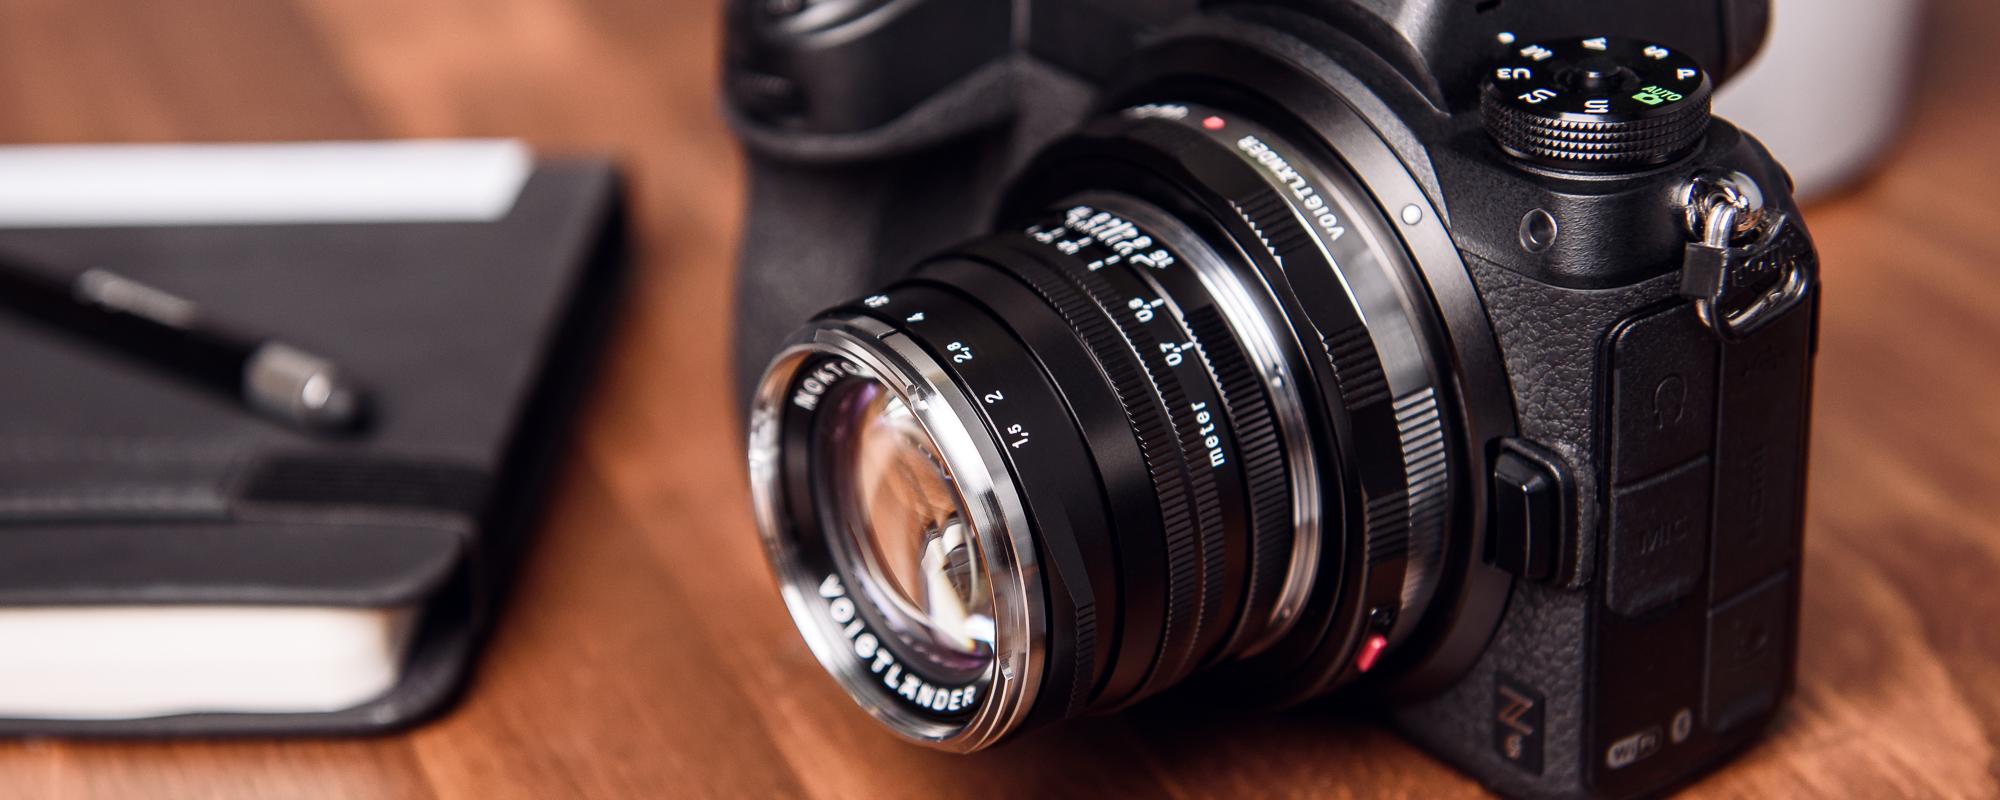 Obiektyw Voigtlander Nokton II 50 mm f/1,5 do Leica M - SC, czarny na aparacie